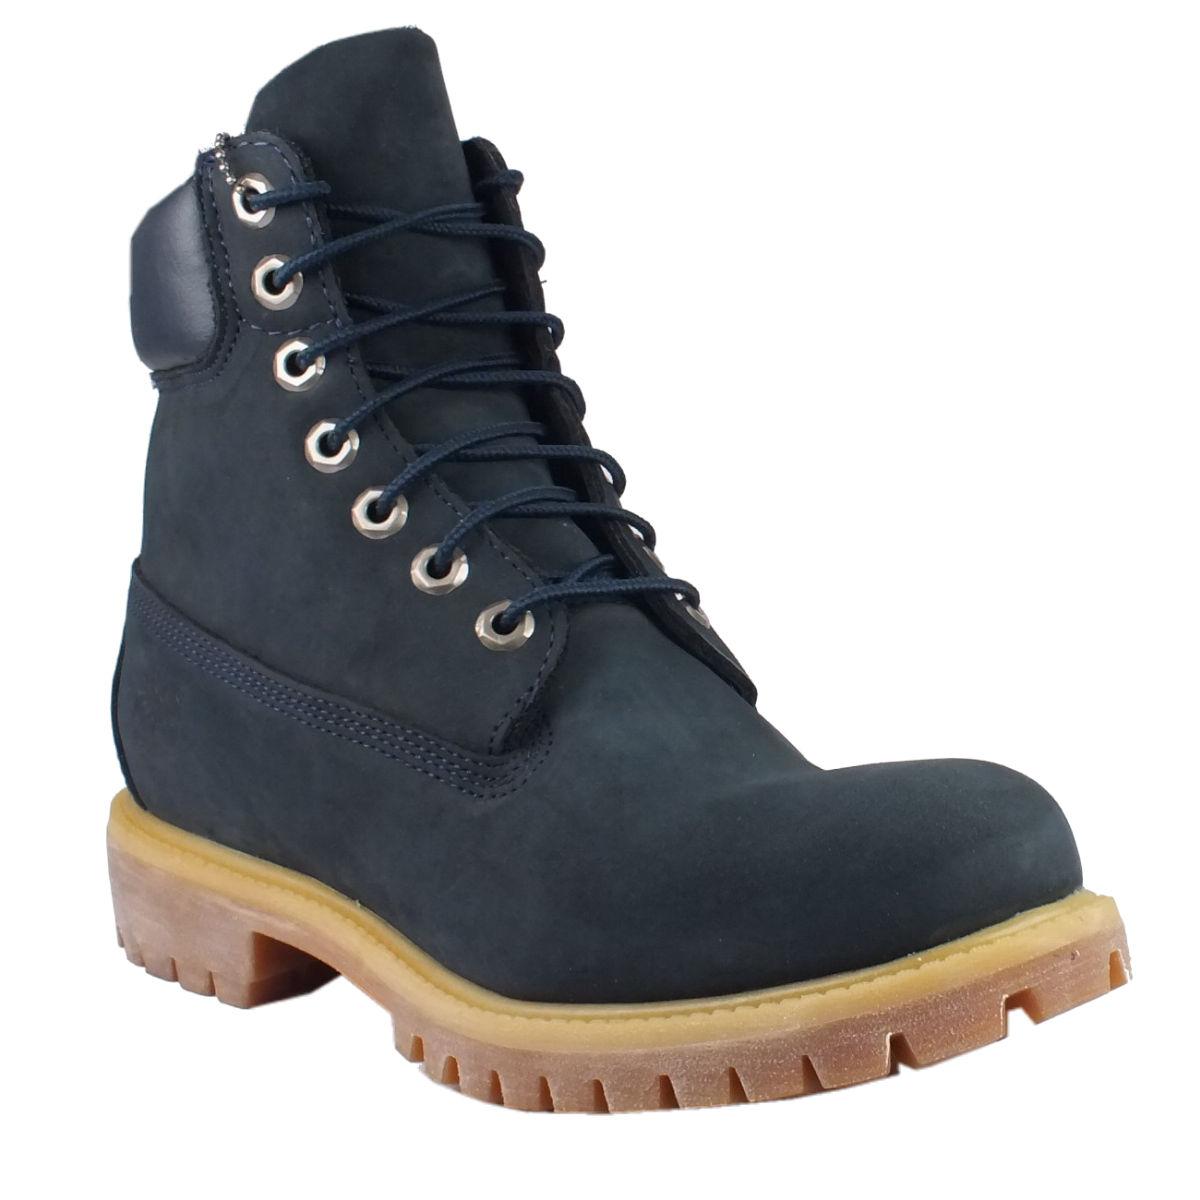 timberland 6 inch premium waterproof boot schuhe stiefel. Black Bedroom Furniture Sets. Home Design Ideas